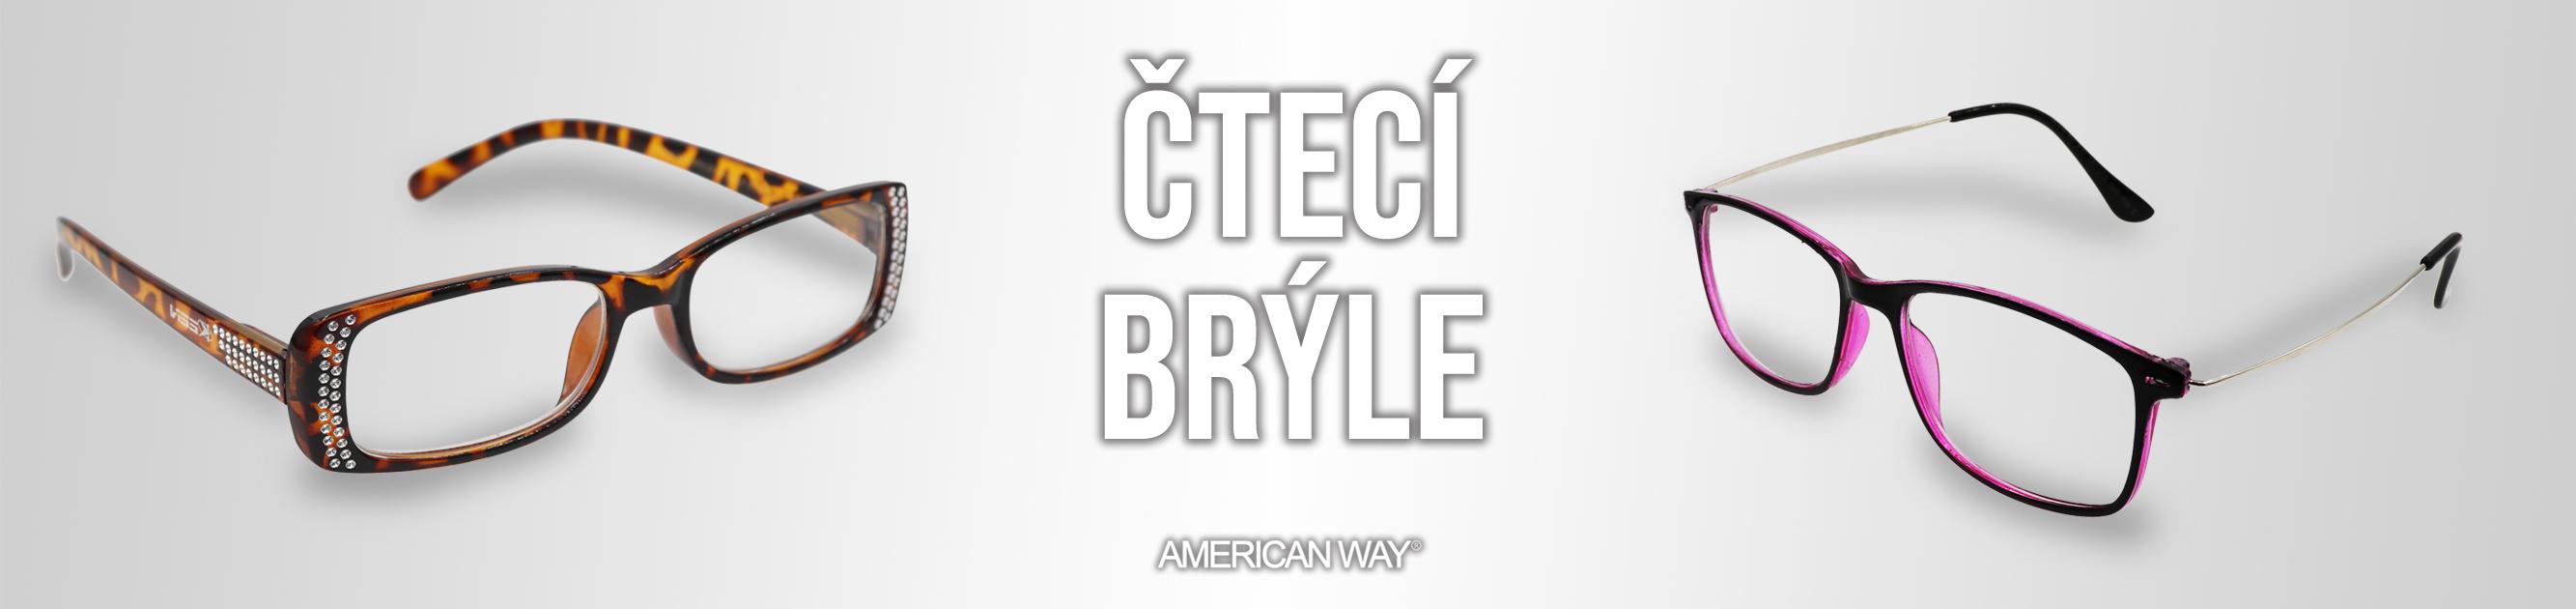 1Cteci_bryle_cz